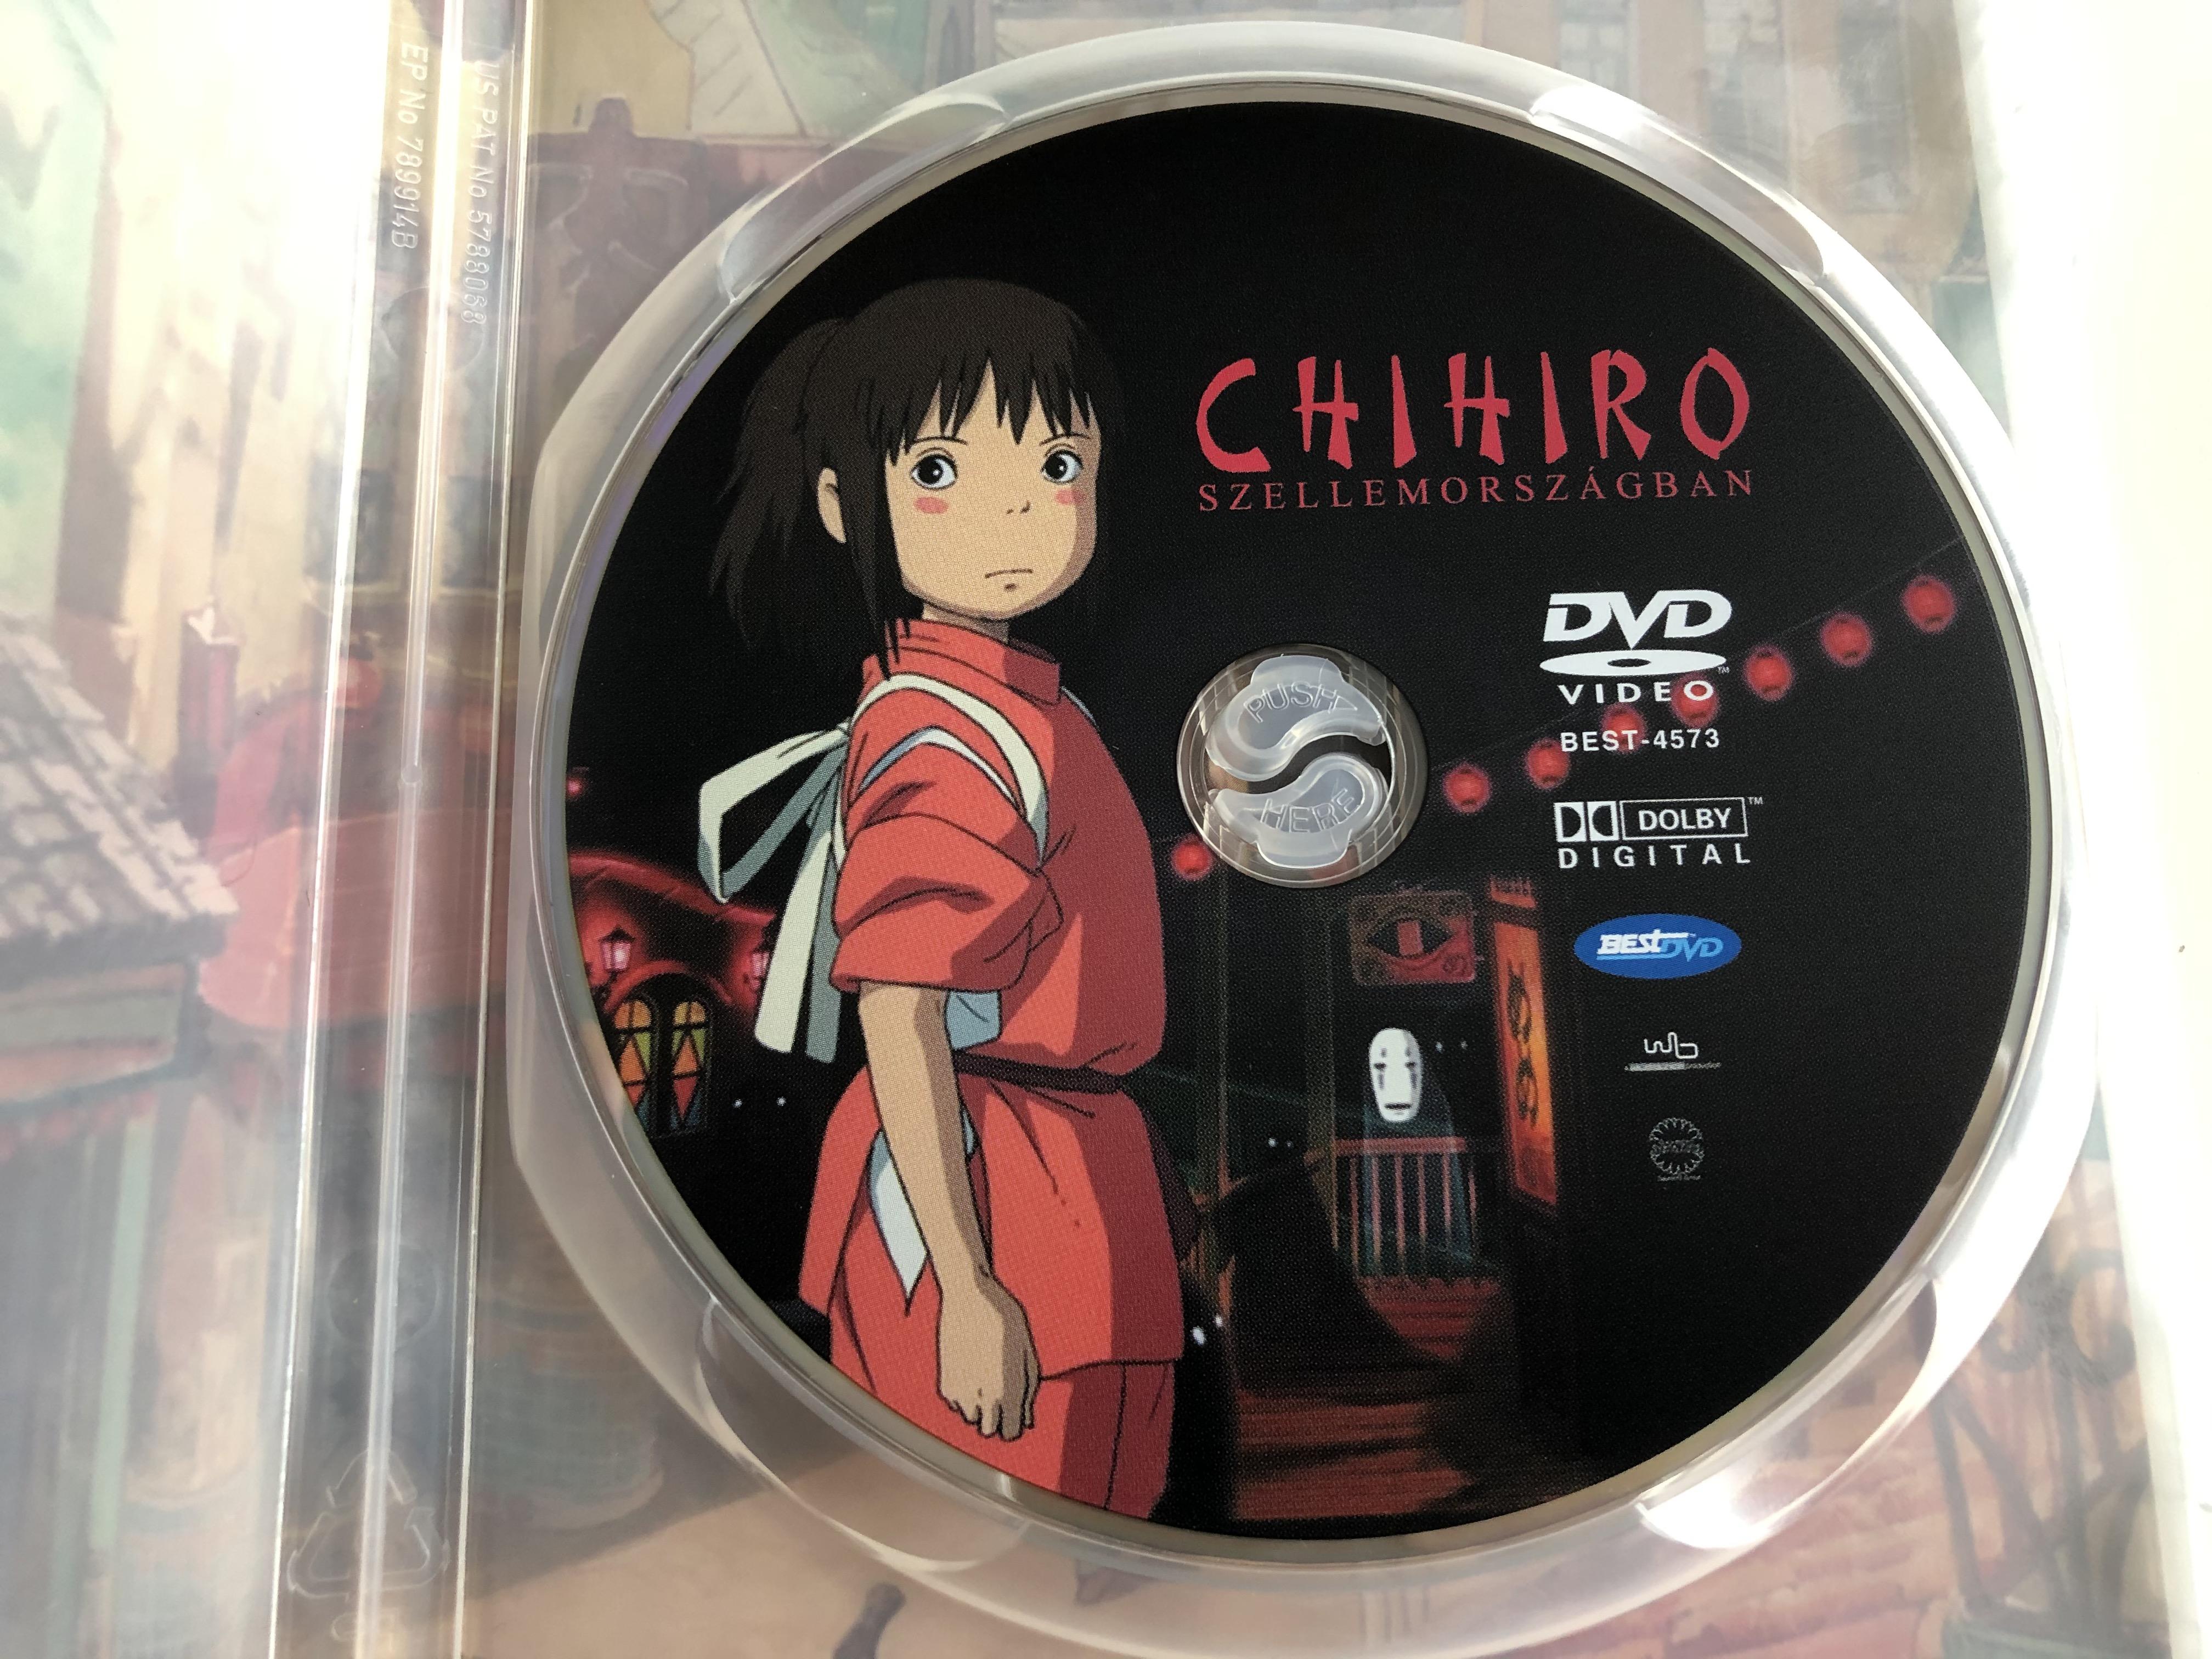 spirited-away-dvd-2001-chihiro-szellemorsz-gban-2.jpg